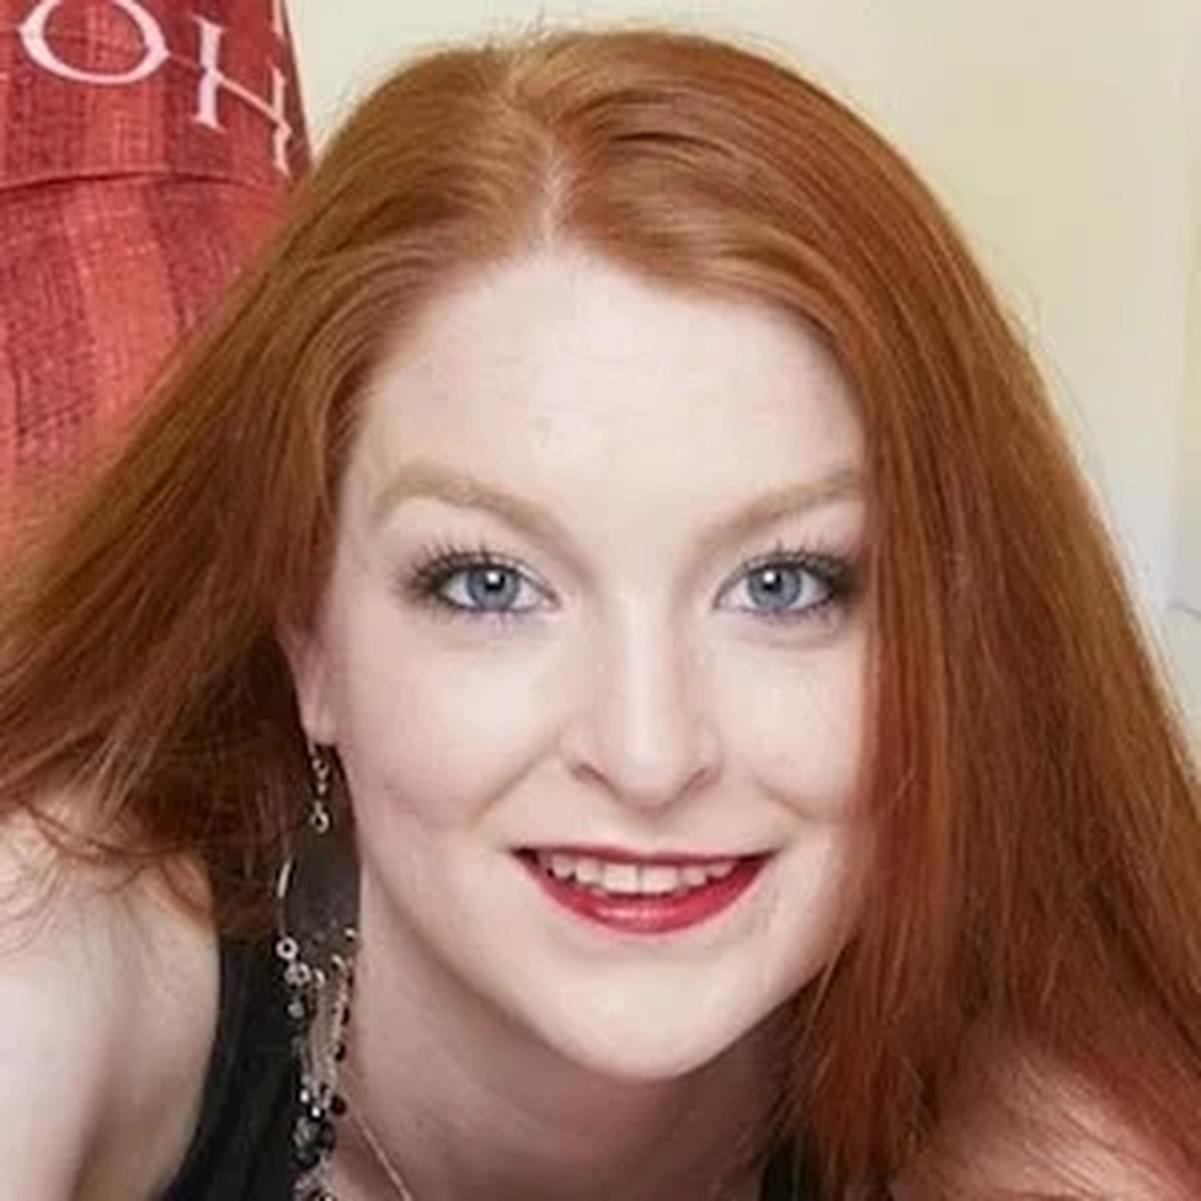 Josephine Gillan | Wiki | Everipedia